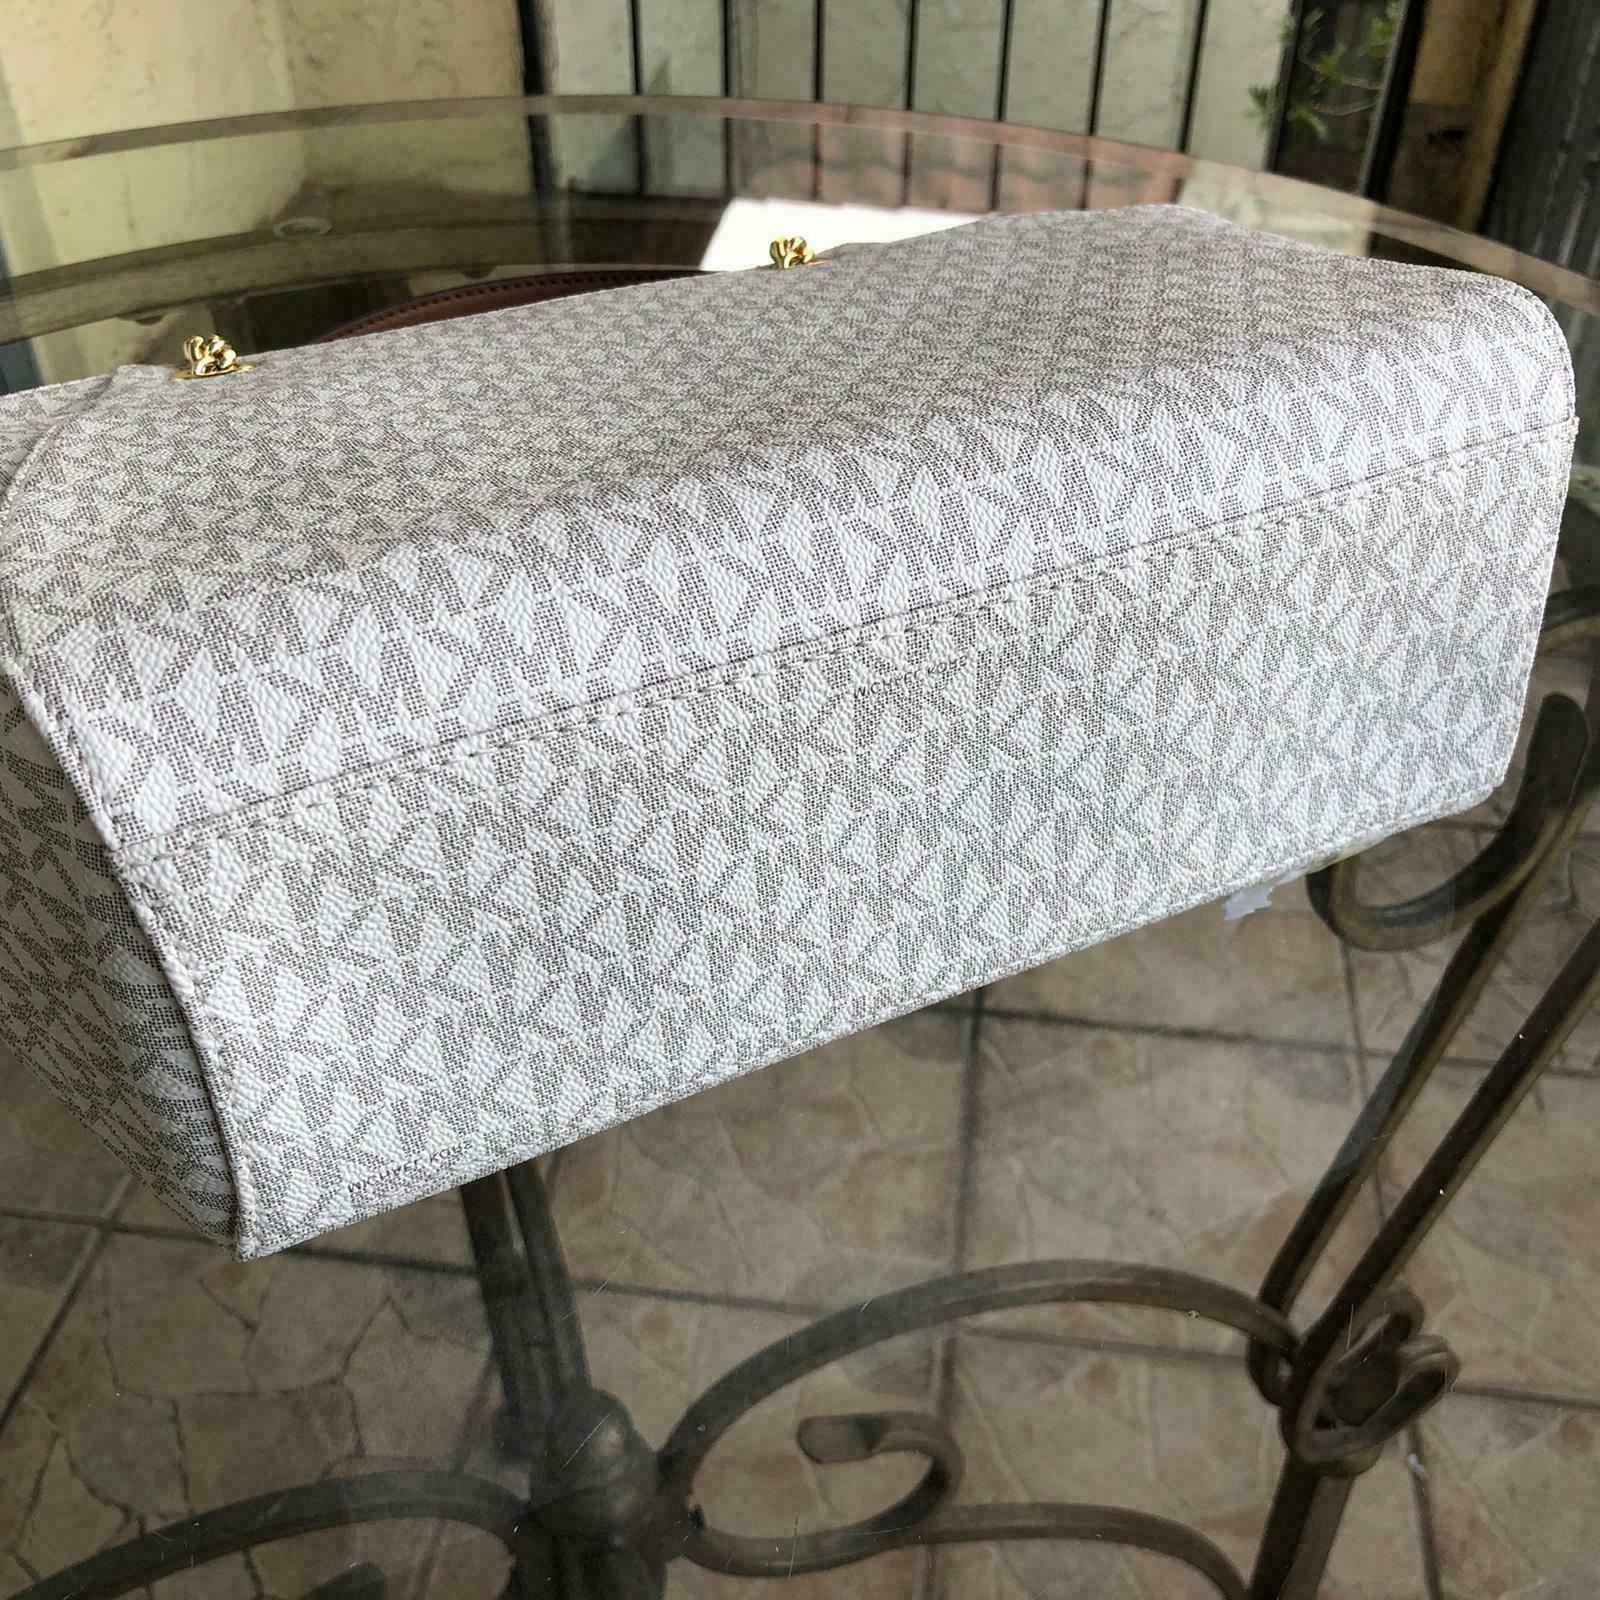 Michael Kors Shoulder Tote Bag Purse Handbag Messenger